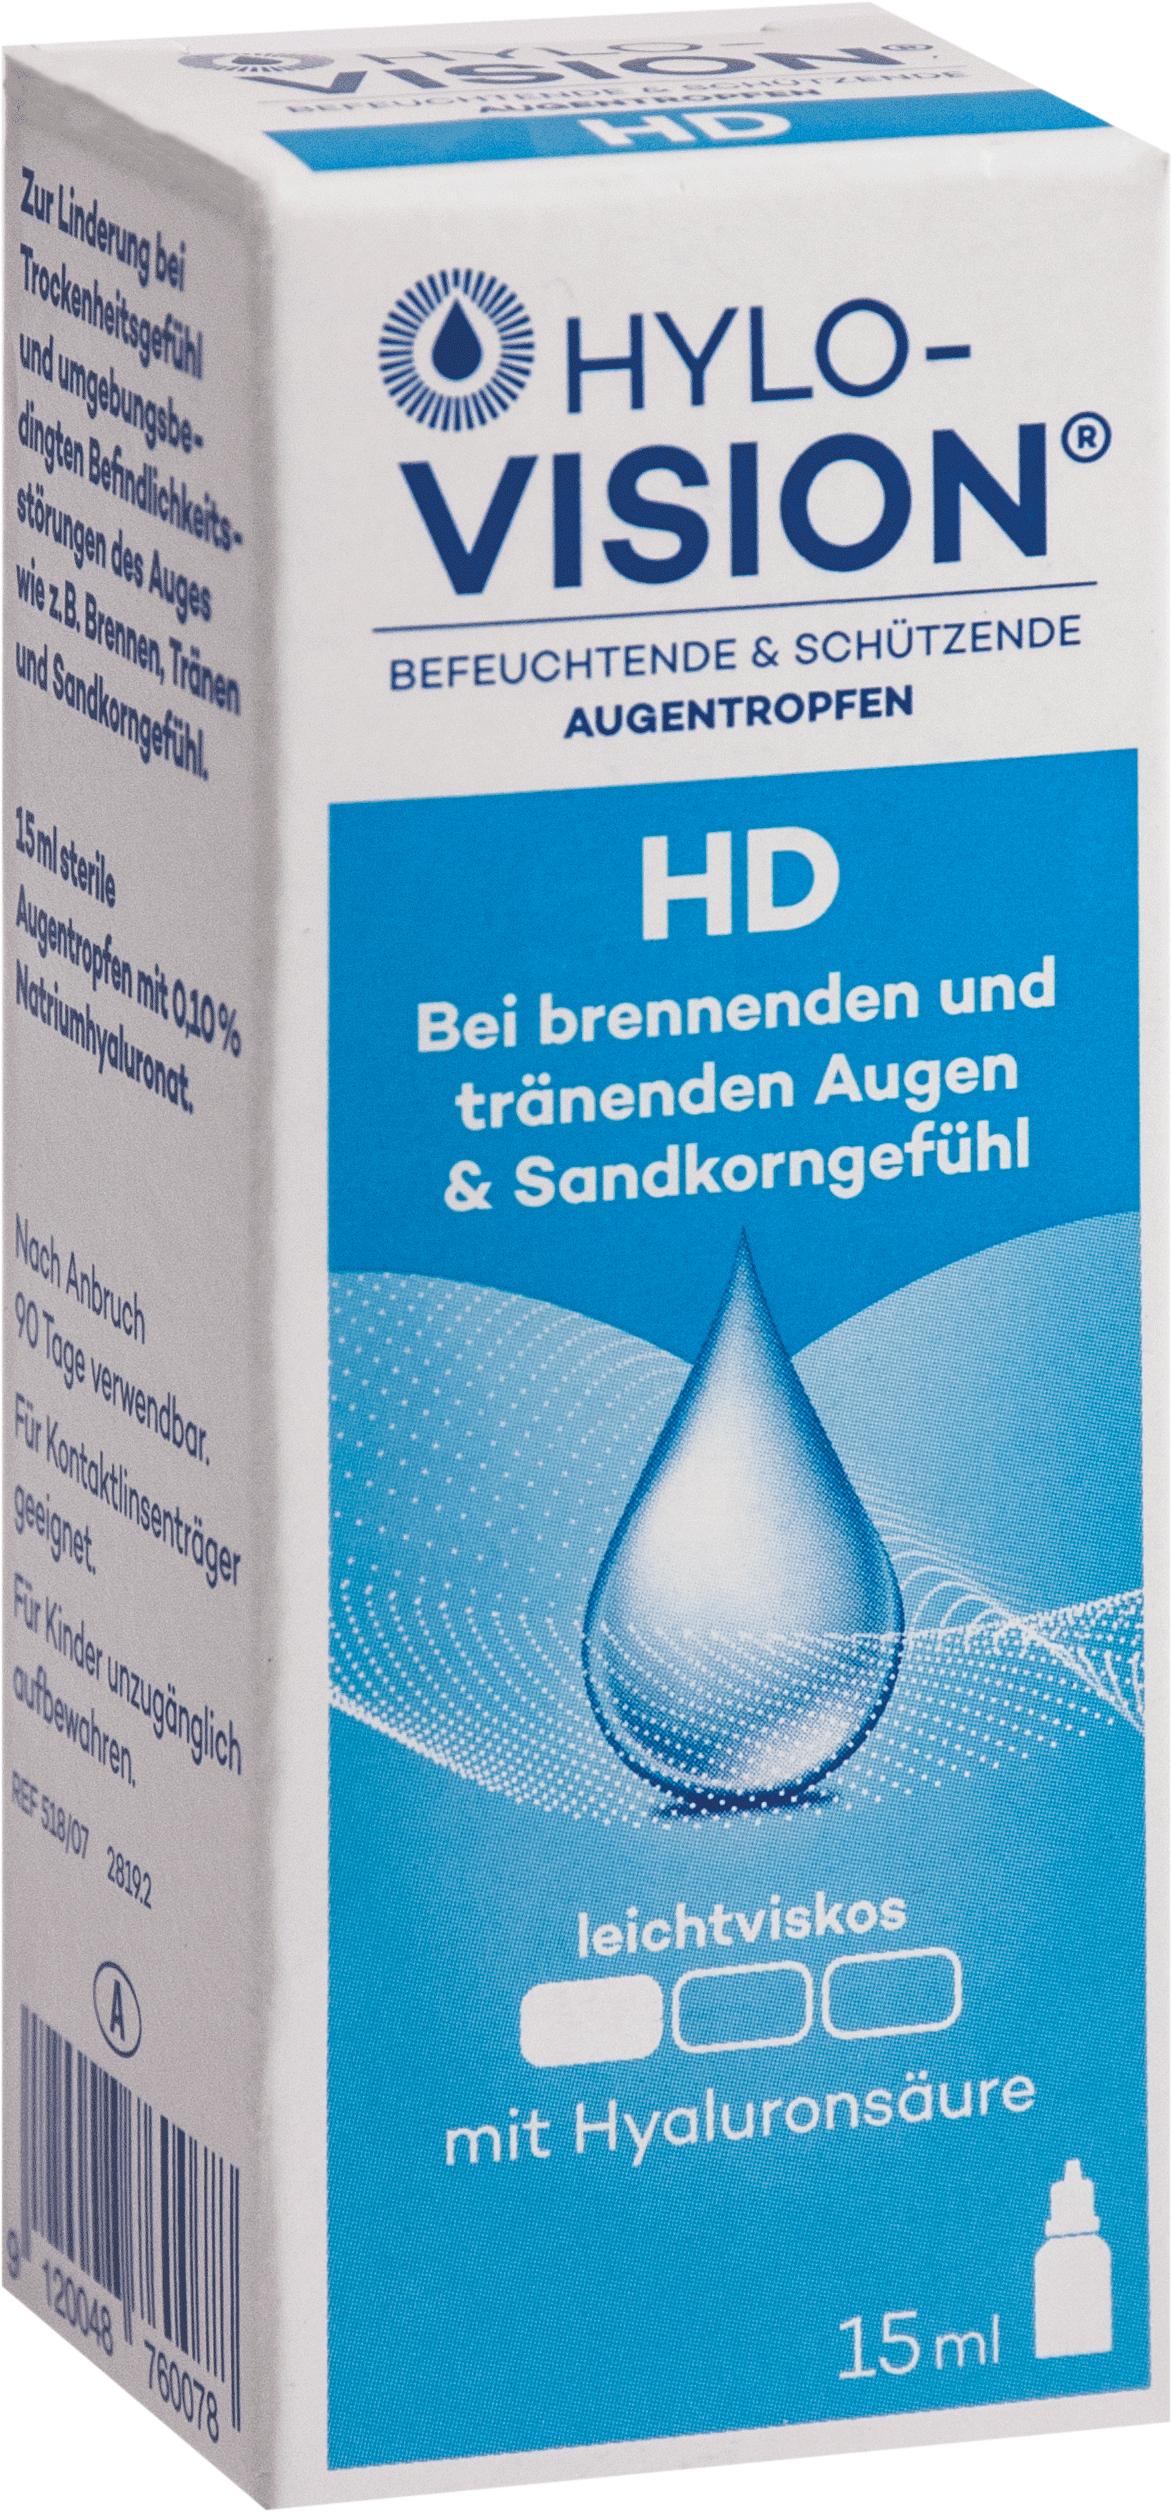 Hylo-Vision HD